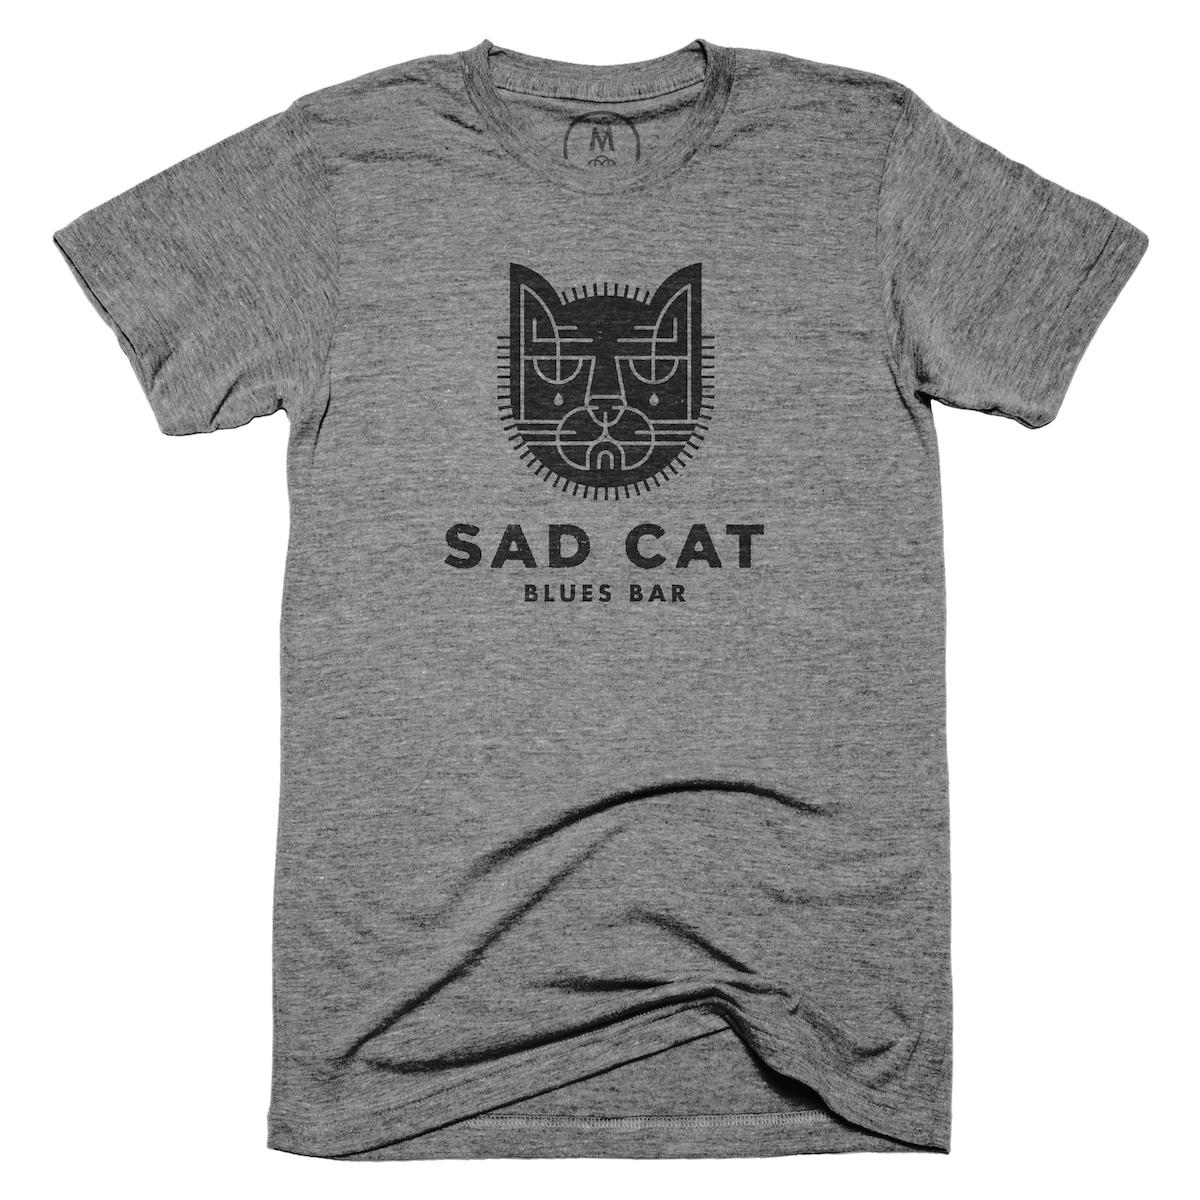 "a35384f70 Sad Cat Blues Bar"" graphic tee by Brian Steely. | Cotton Bureau"